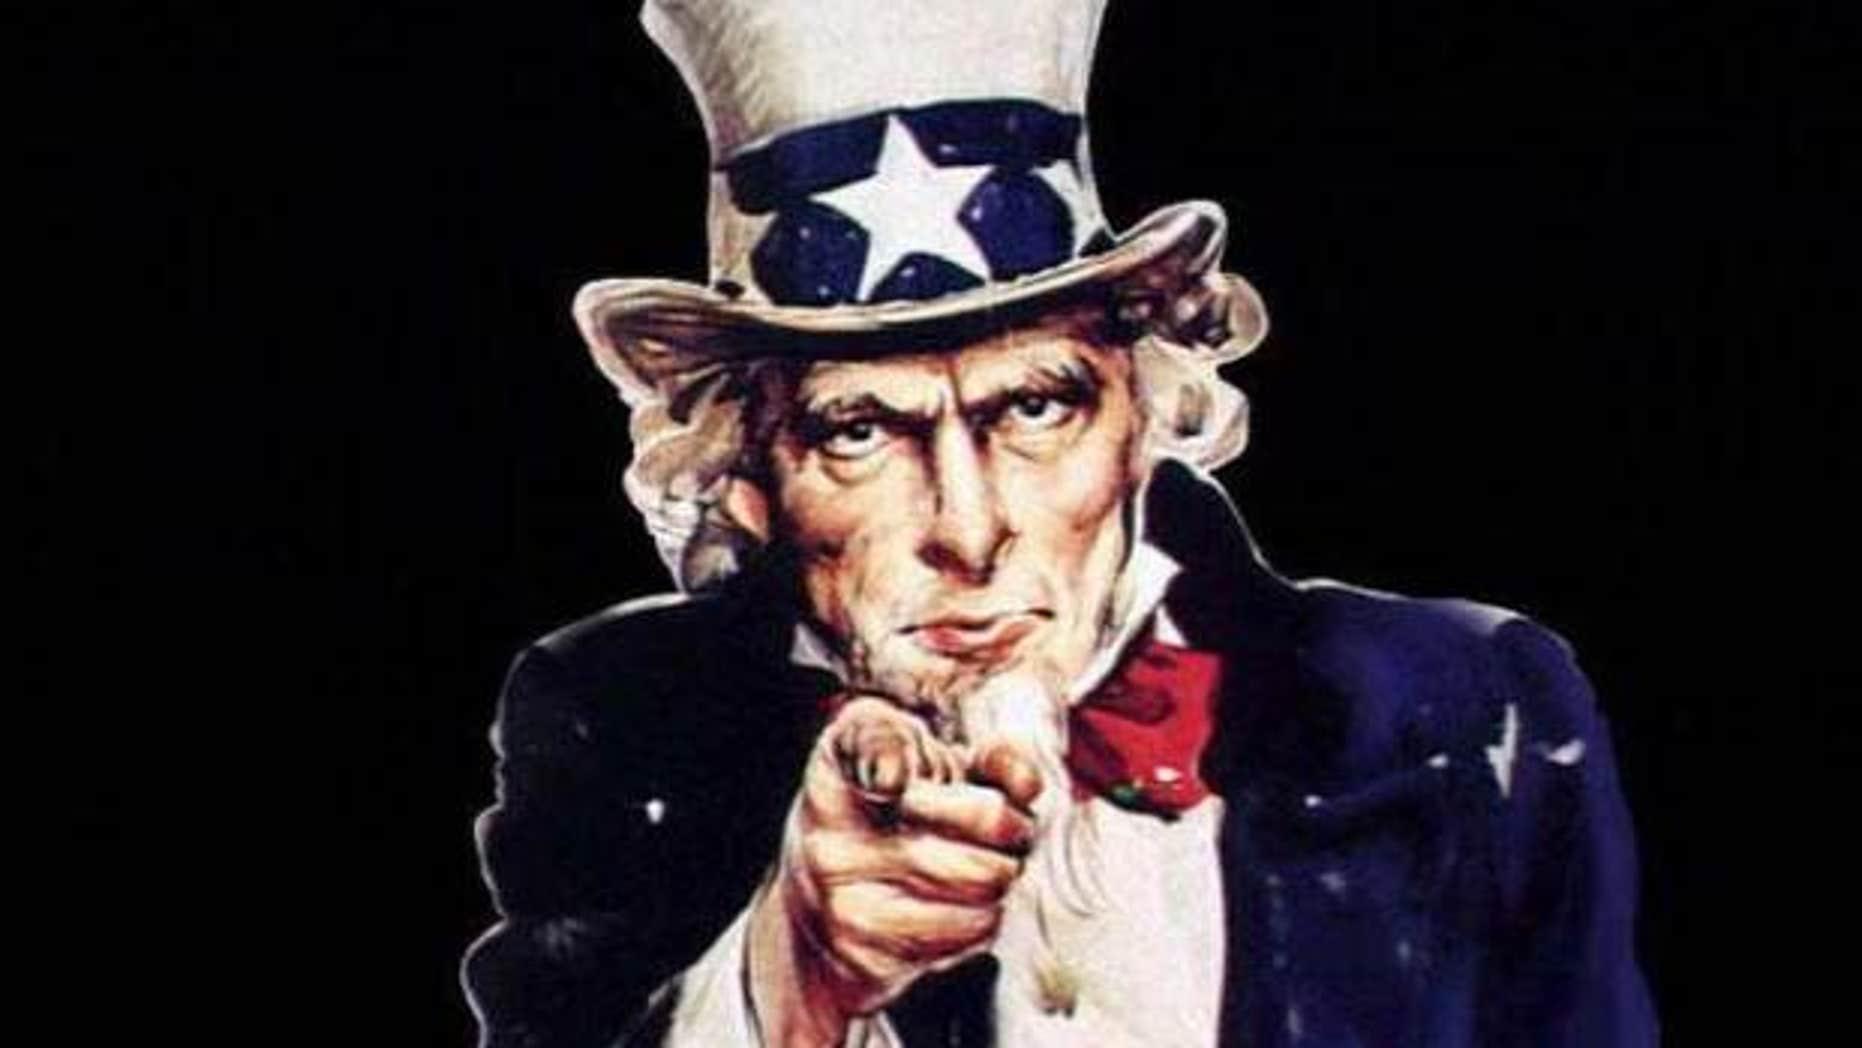 Uncle Sam portrait by James Mongomery Flagg. (AP)